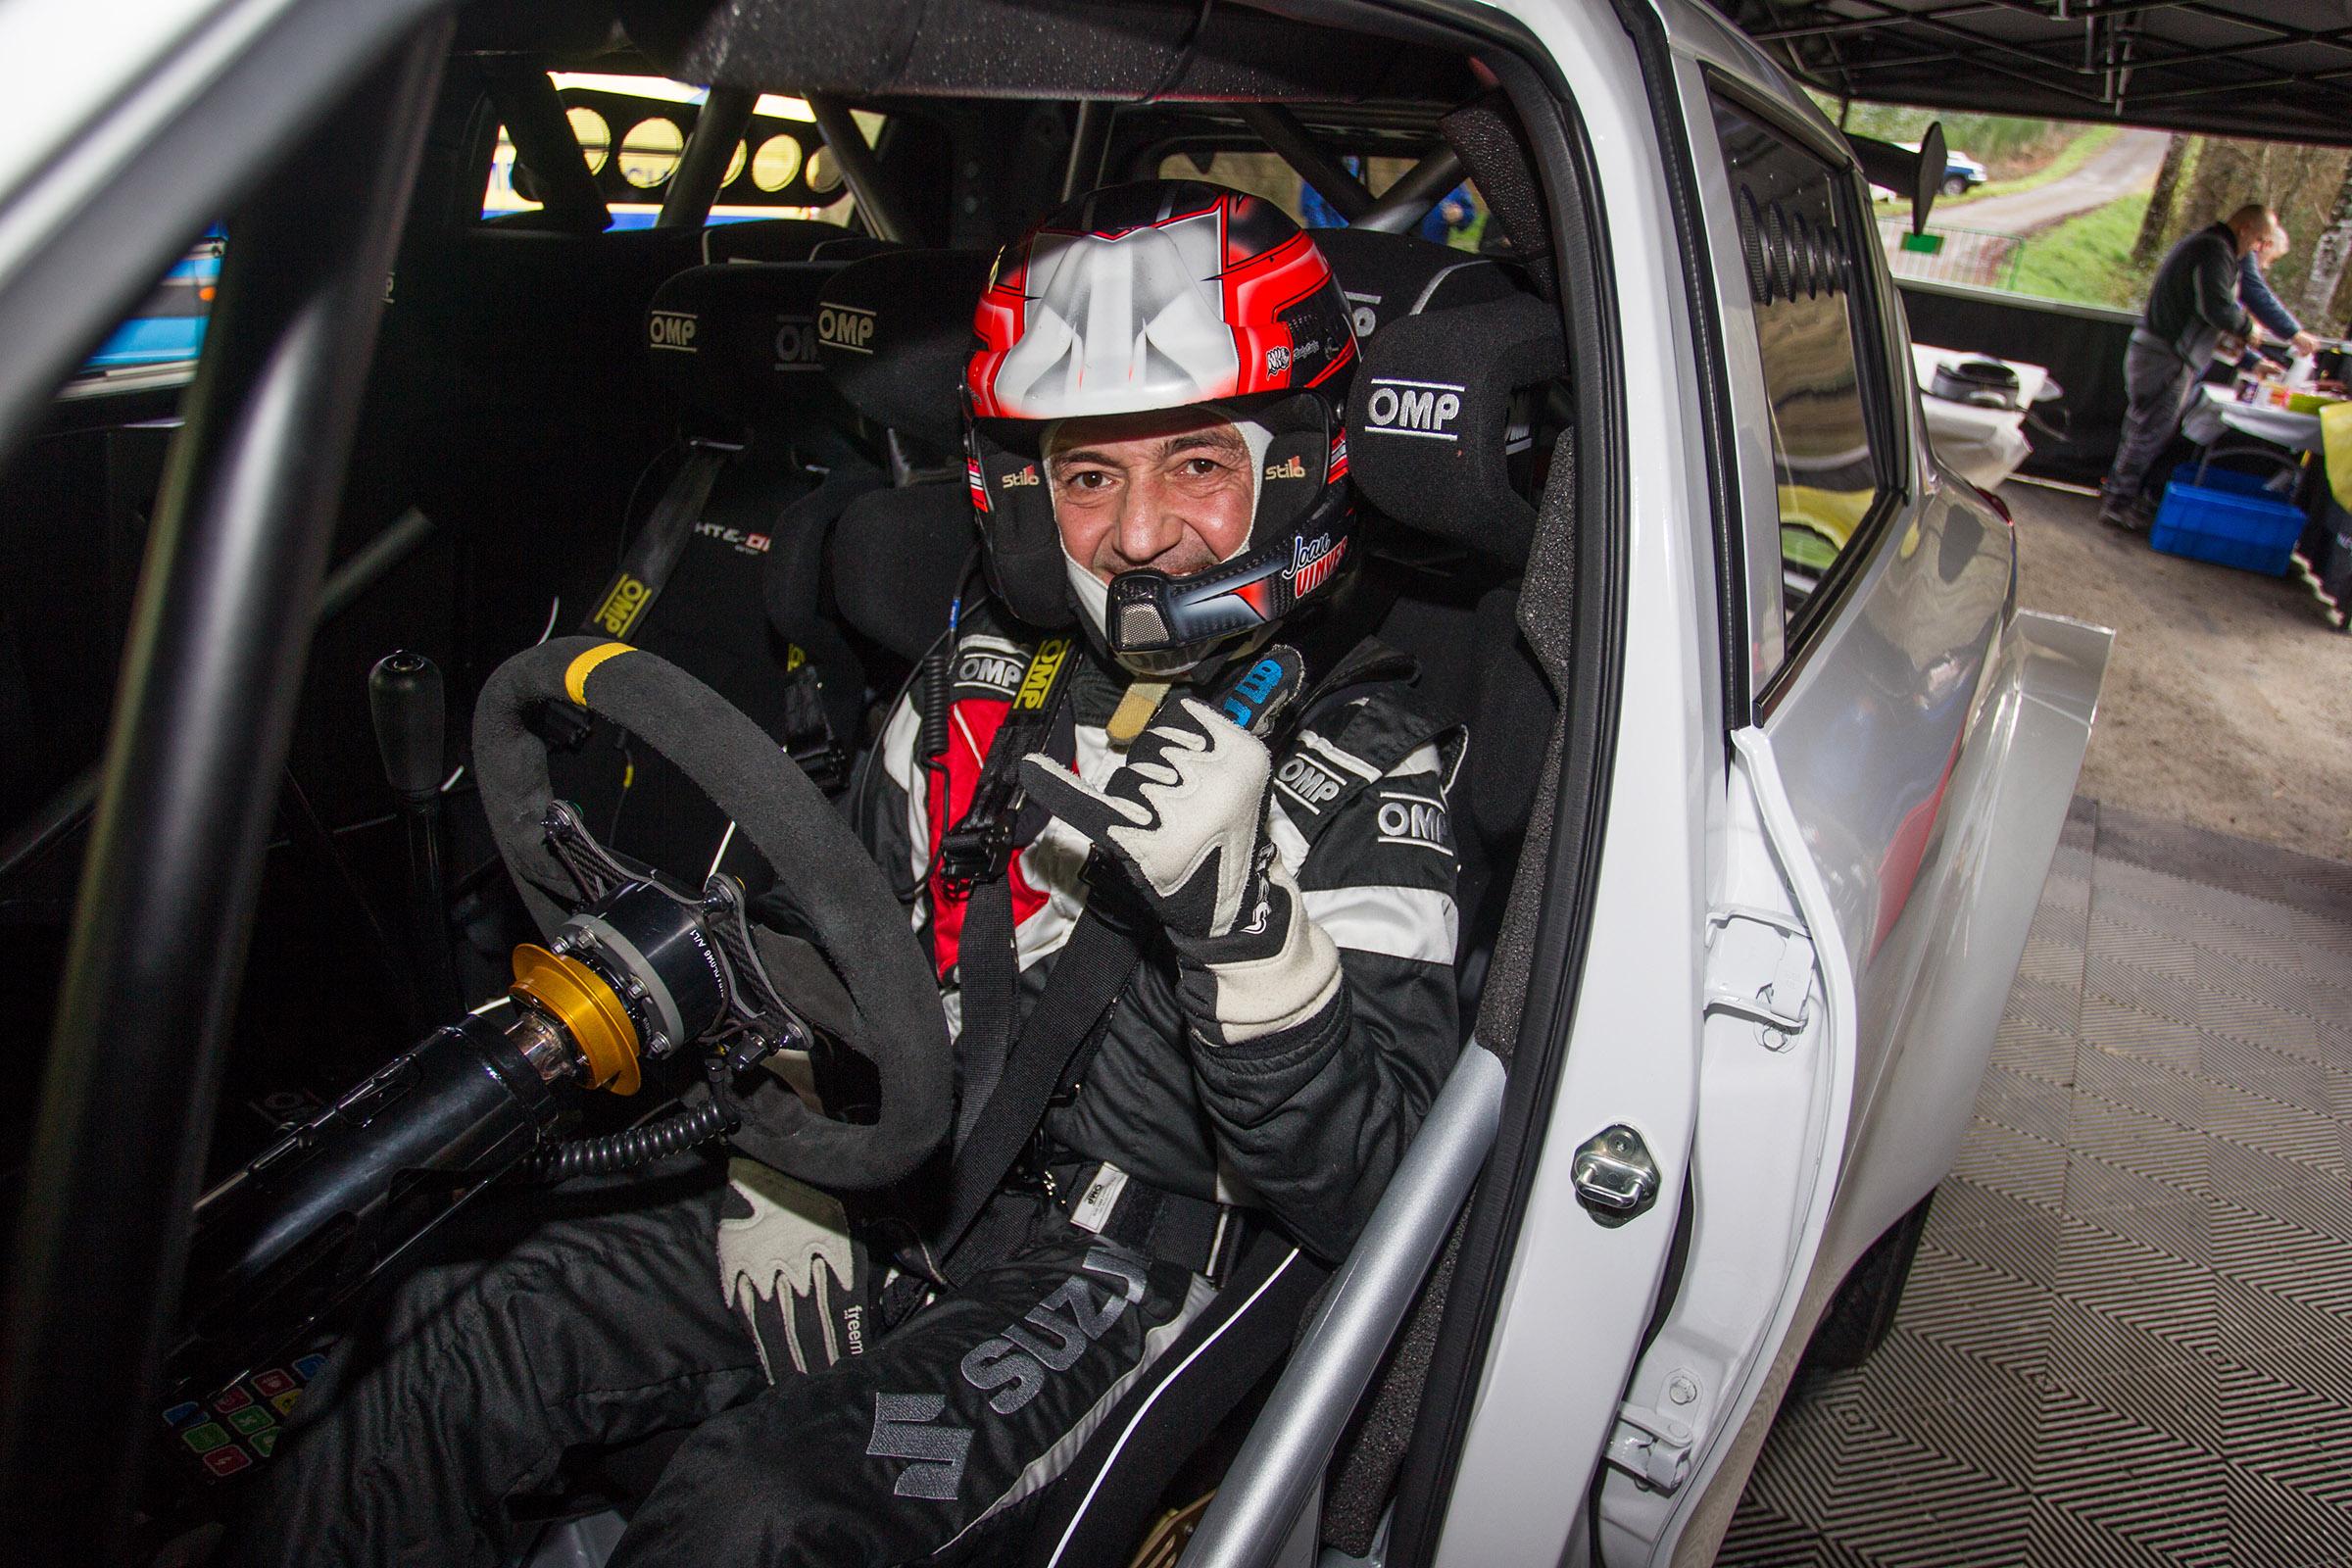 Joan Vinyes - Jordi Mercader posen al Suzuki Swift R4lly S a la terra.